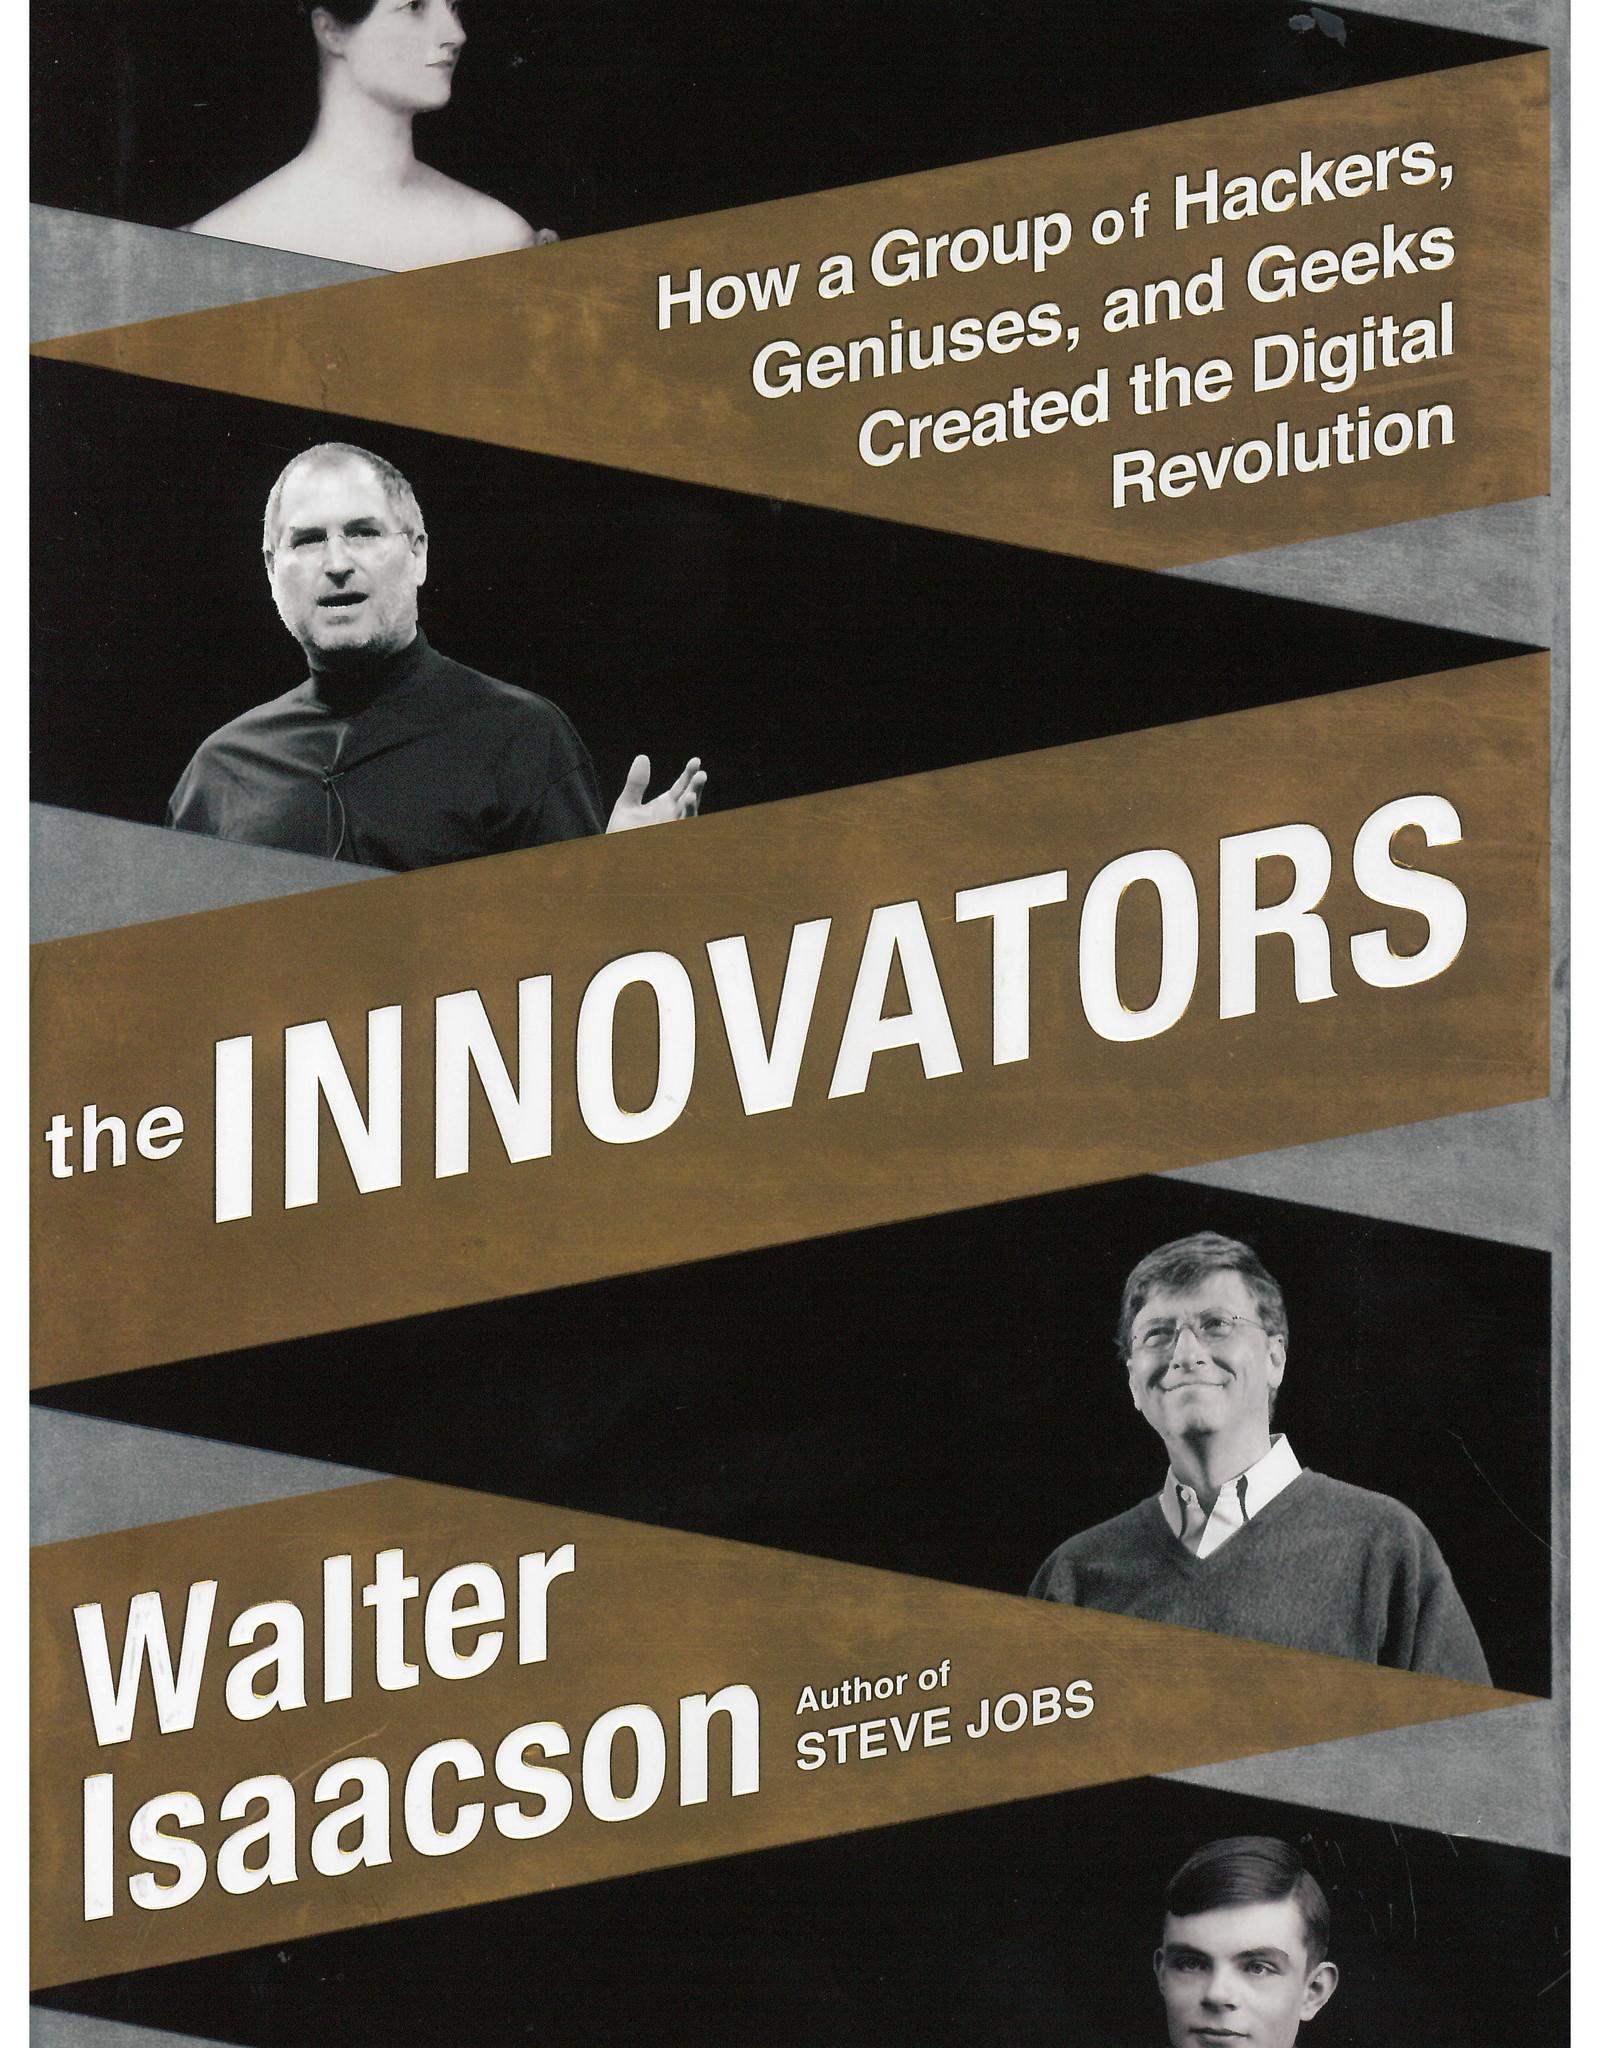 The Innovators / Walter Isaacson